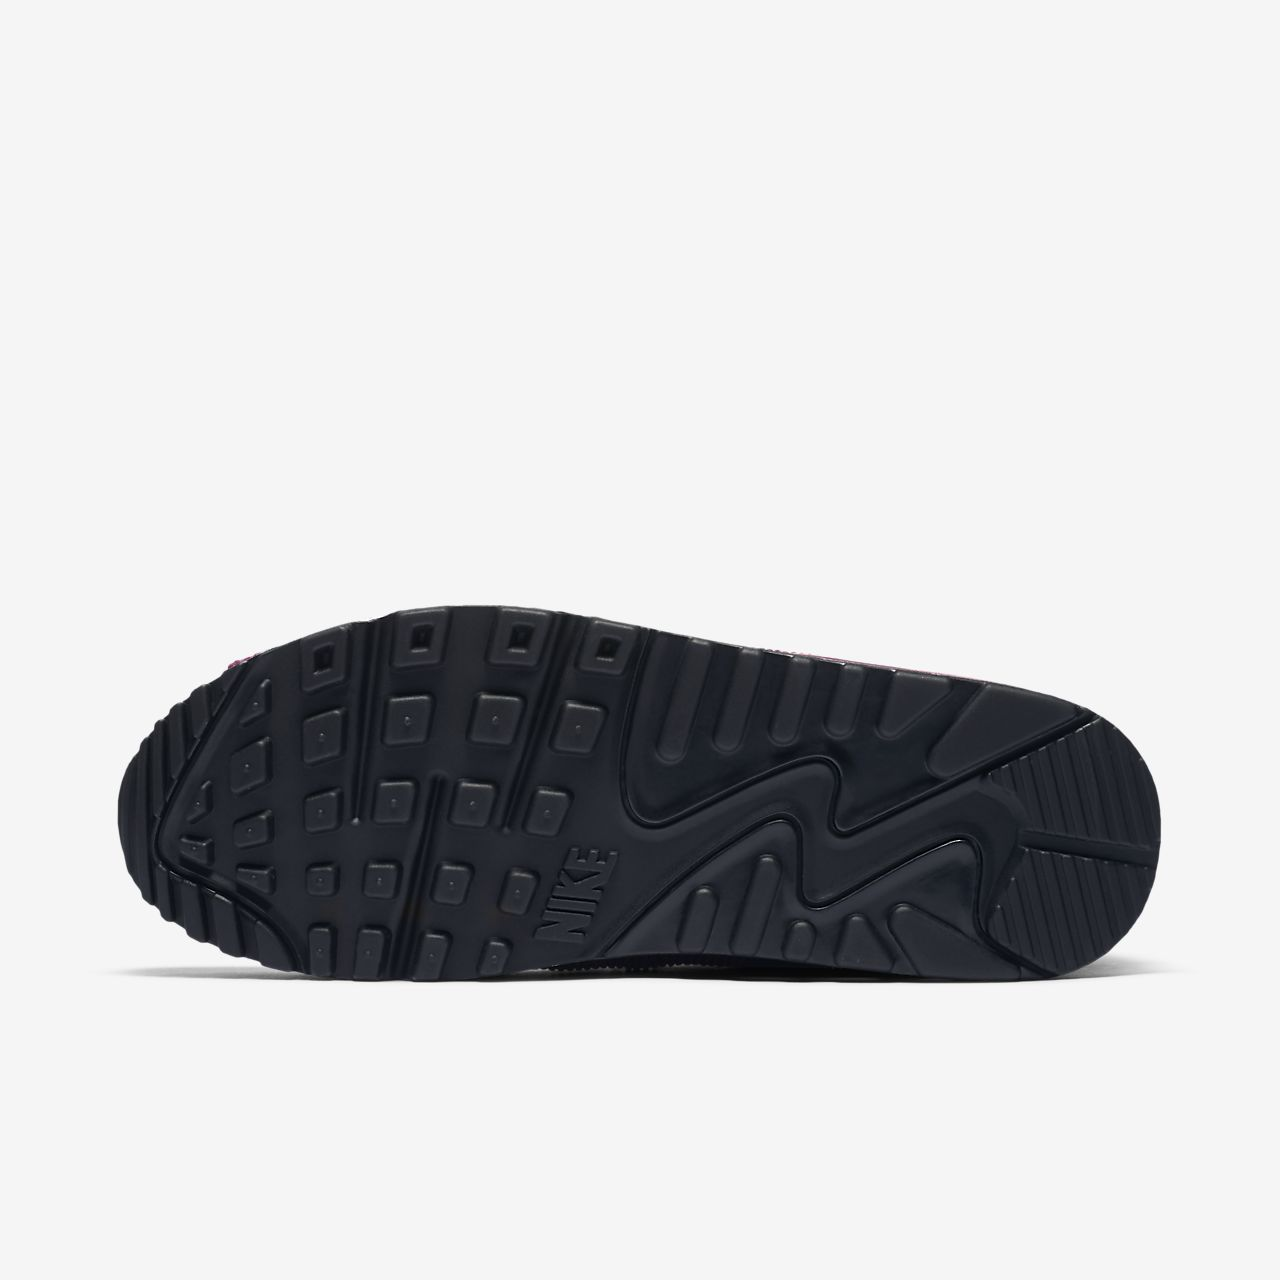 scarpa nike air max 90 bordeauxnerobiancobordeaux 921304 601